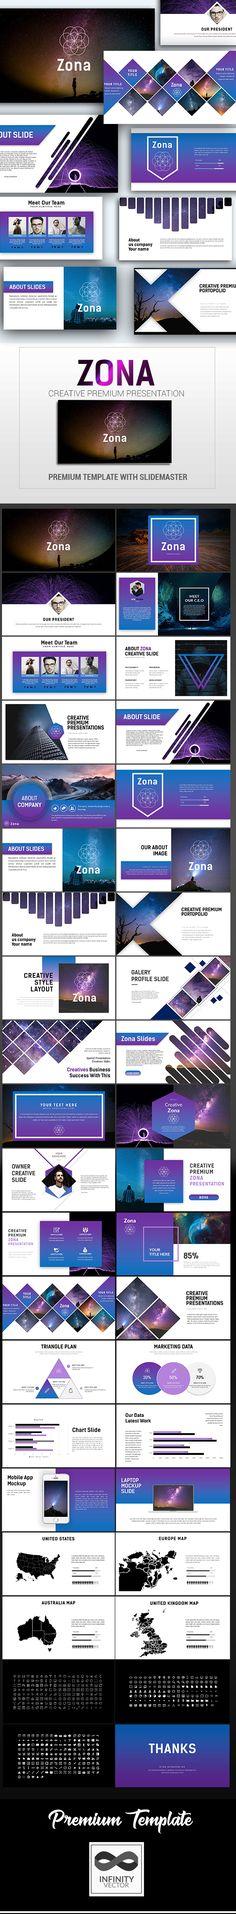 Zona Creative Presentation - #PowerPoint #Templates Presentation #Templates